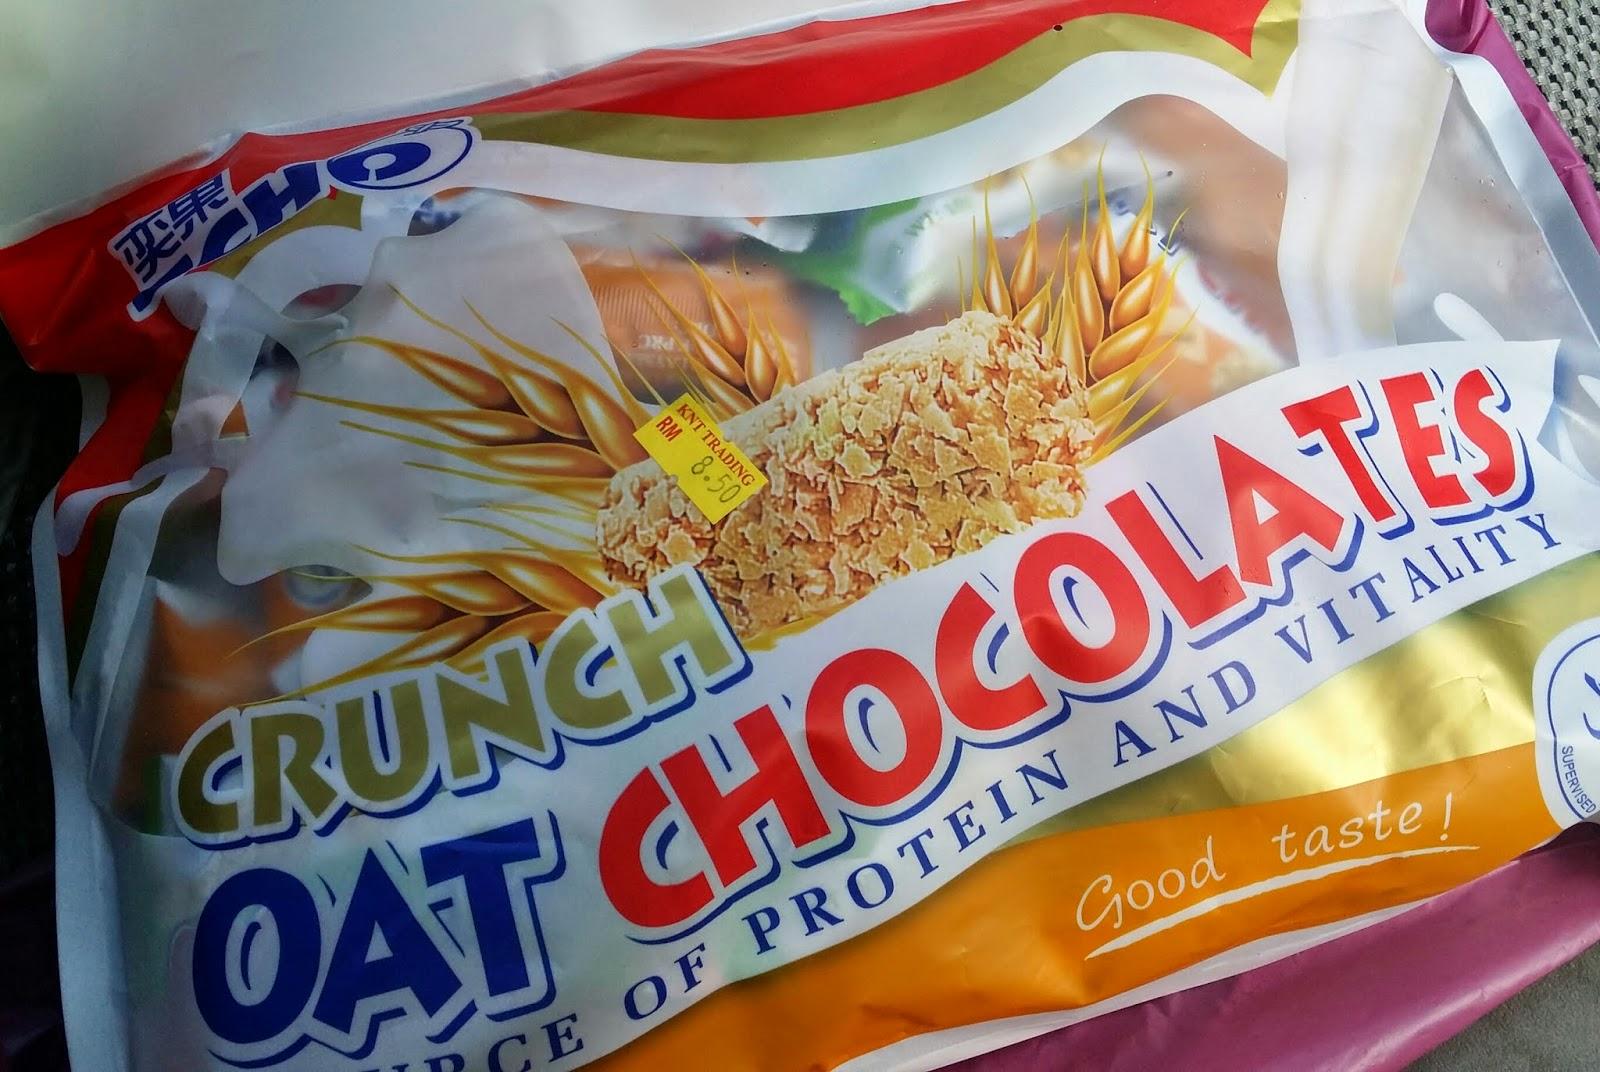 biskut oat, biskut oat sedap, harga biskut oat, harga sebenar biskut oat twinfish, biskut oat murah, mydin jual biskut oat murah,